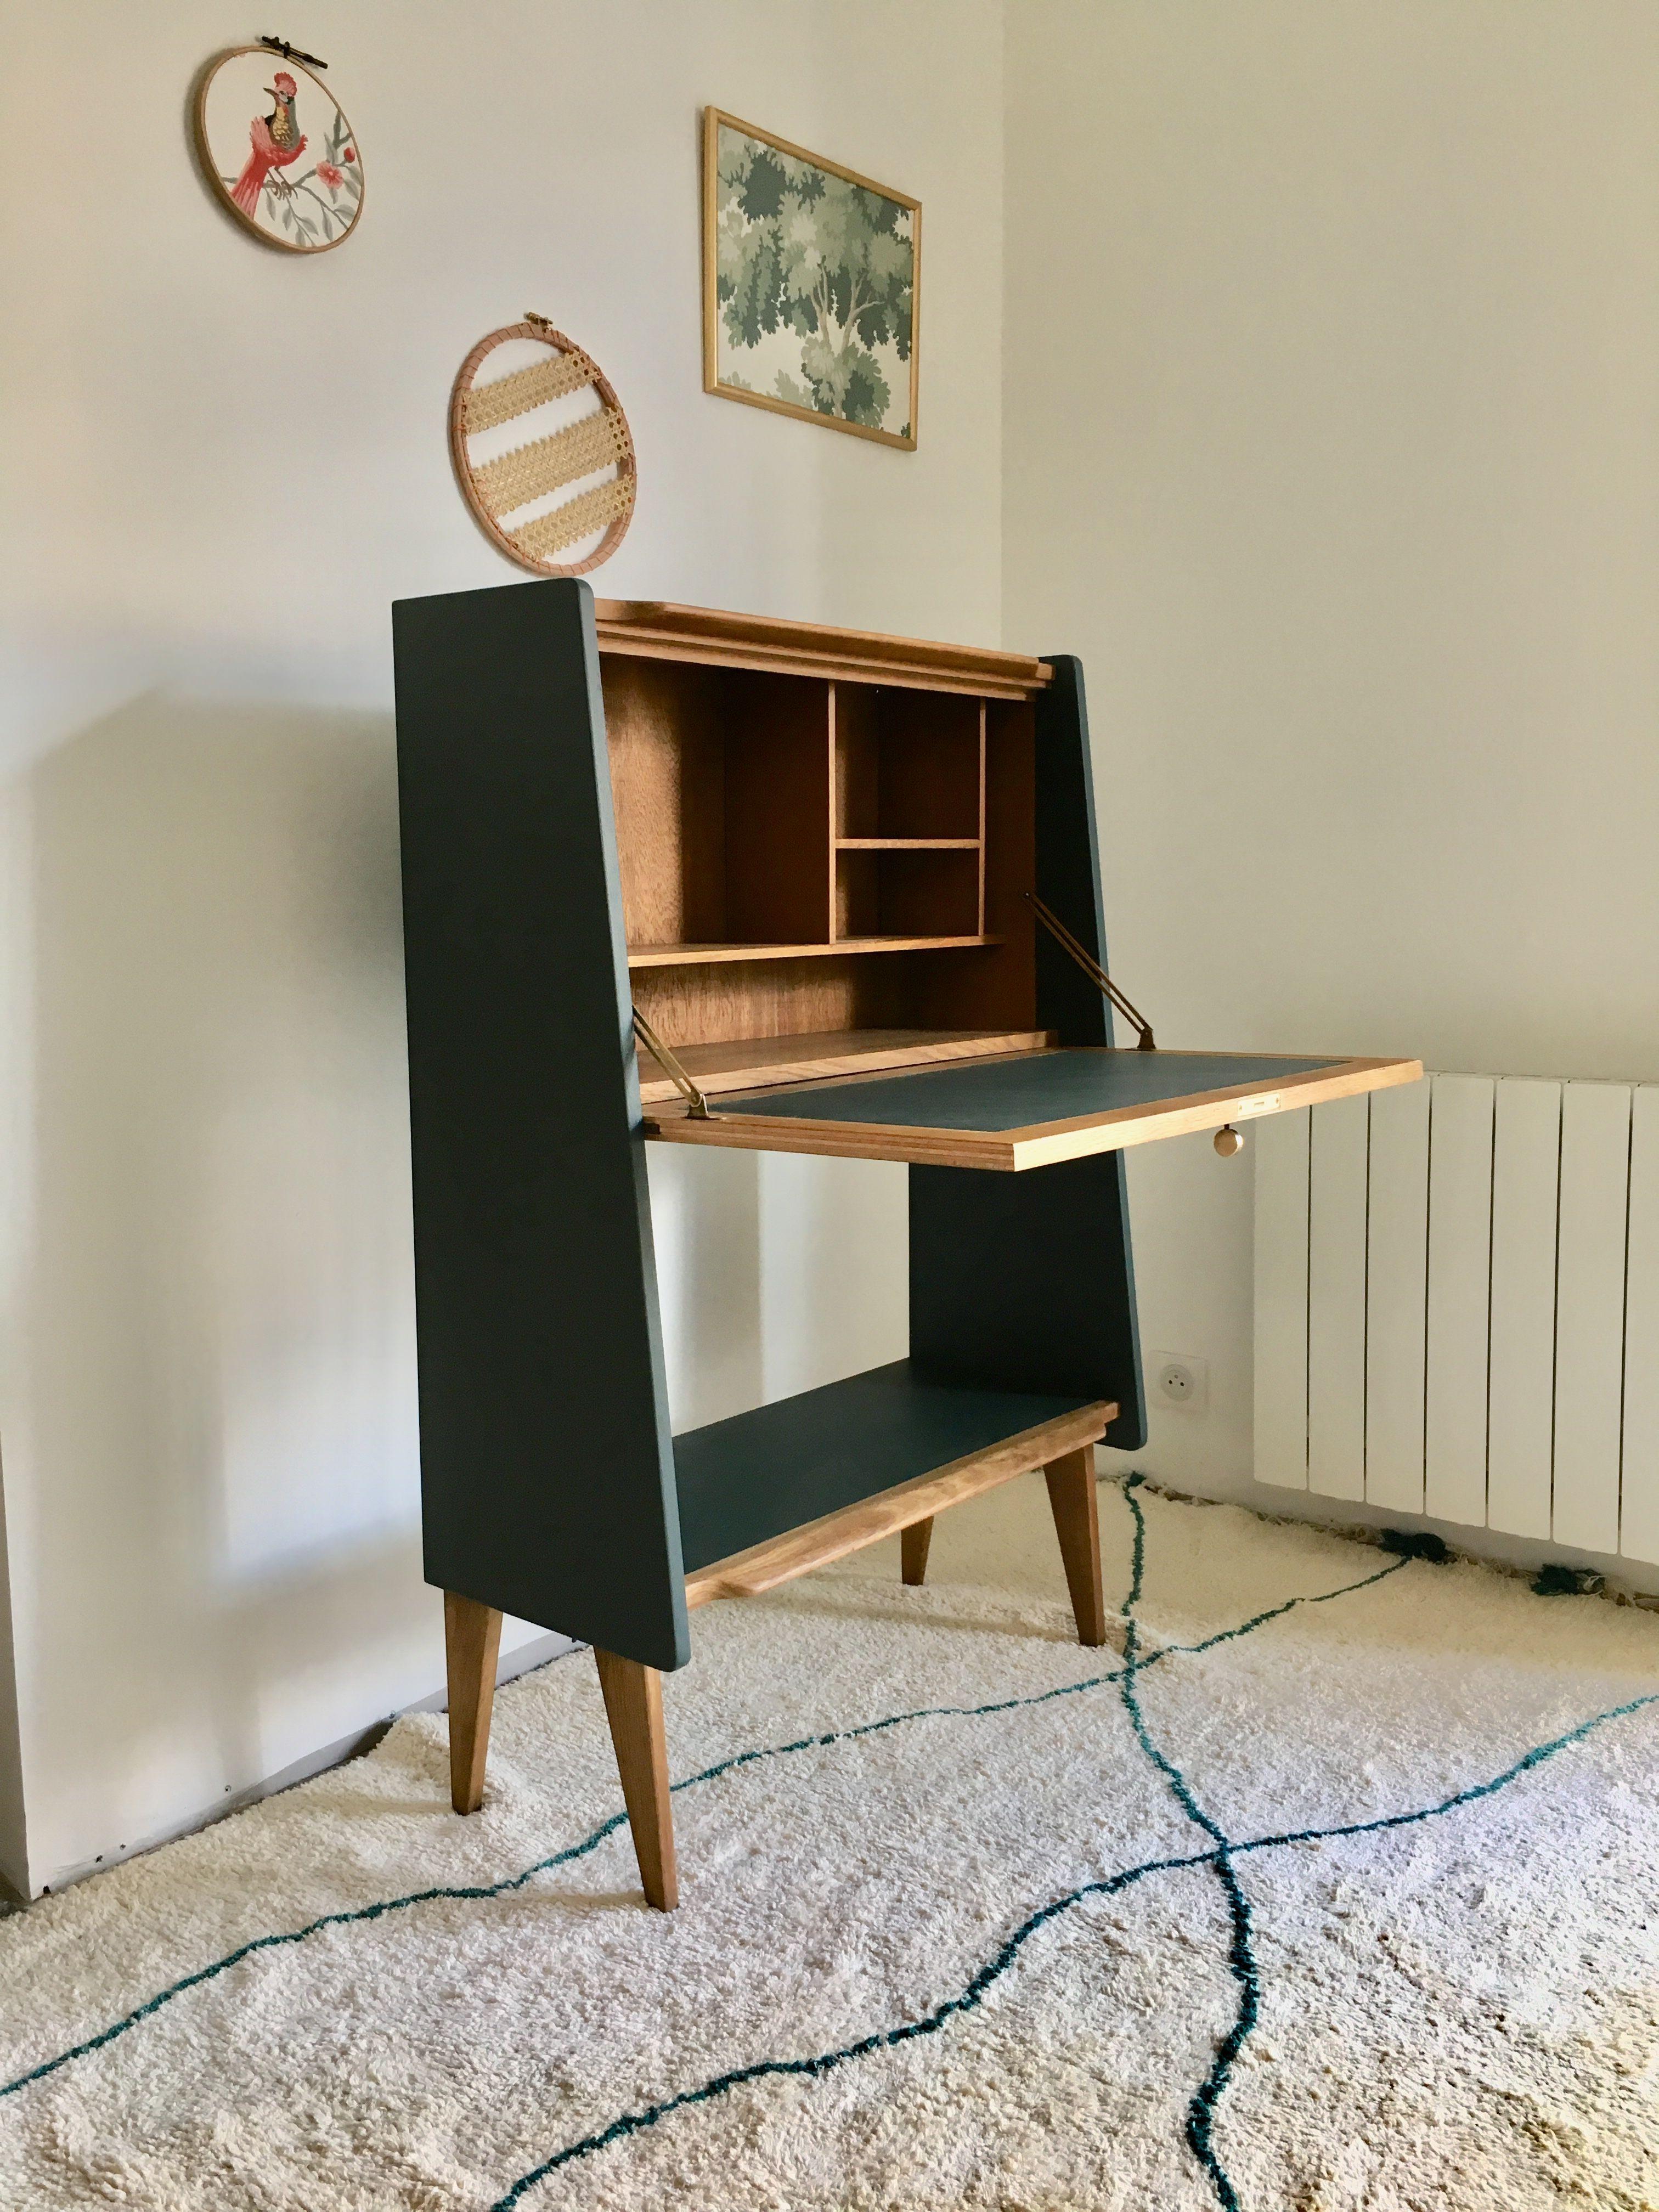 Secretaire Vintage Relooke Relooker Meuble Mobilier De Salon Relooking Meuble